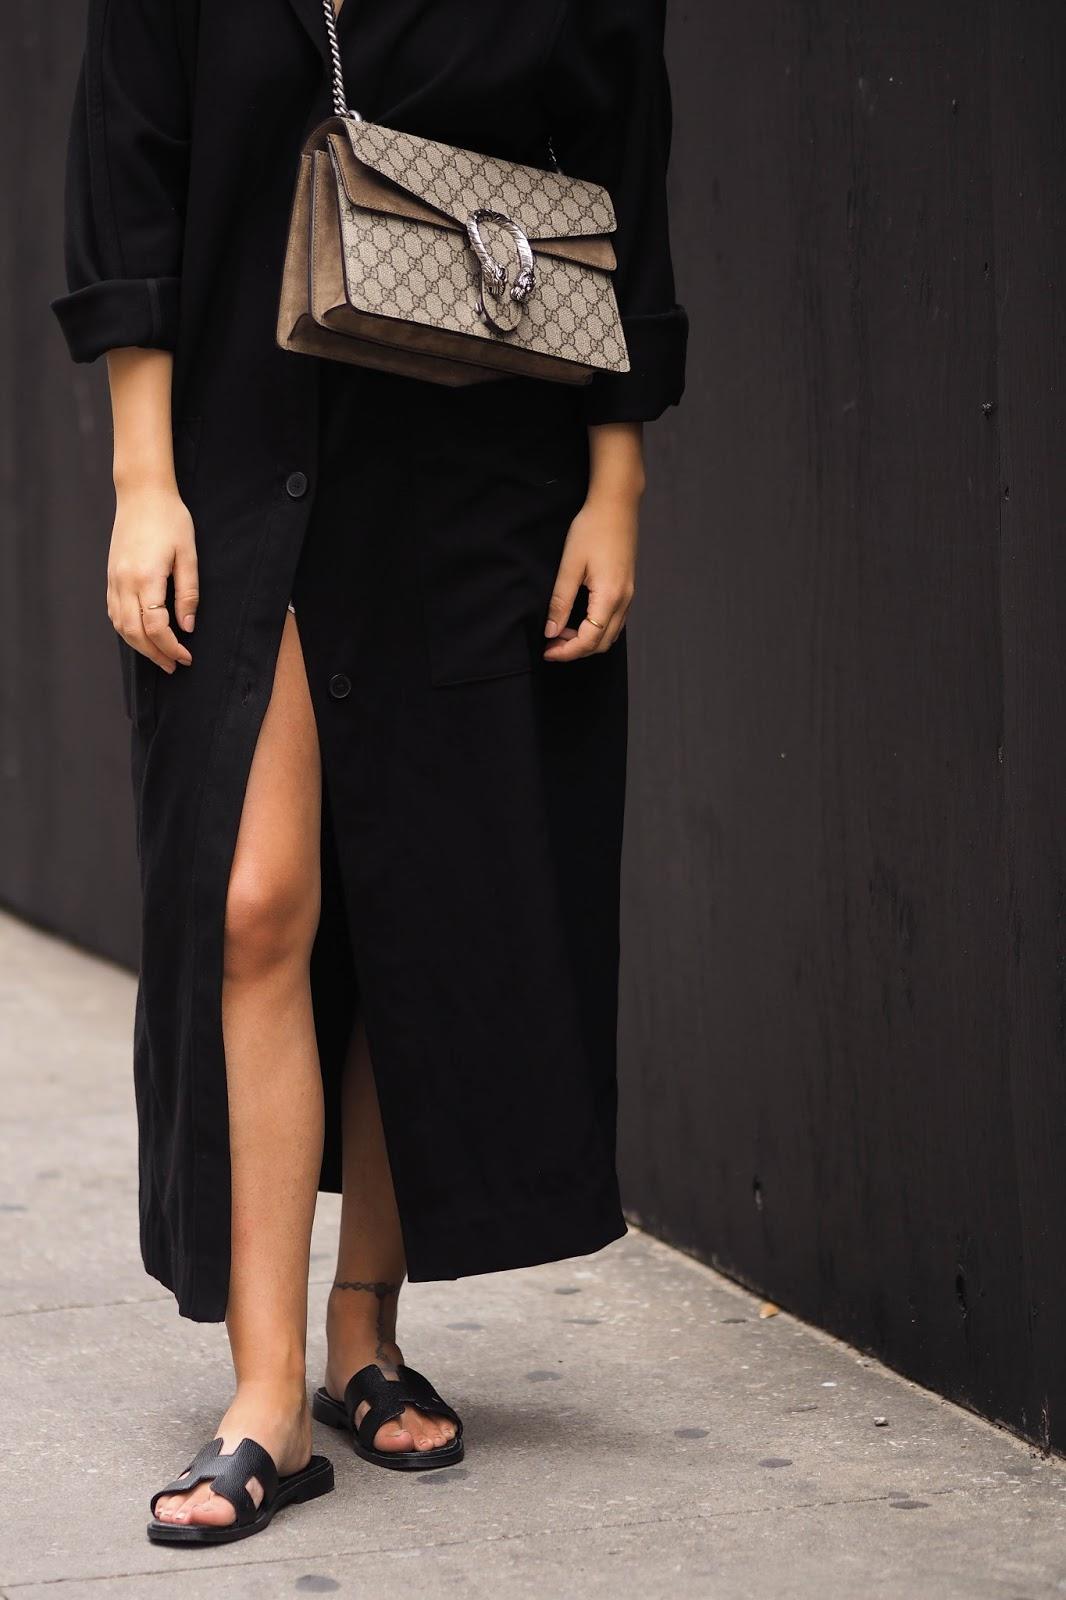 gucci dionysus bag streetstyle the fashion fix fashion blogger